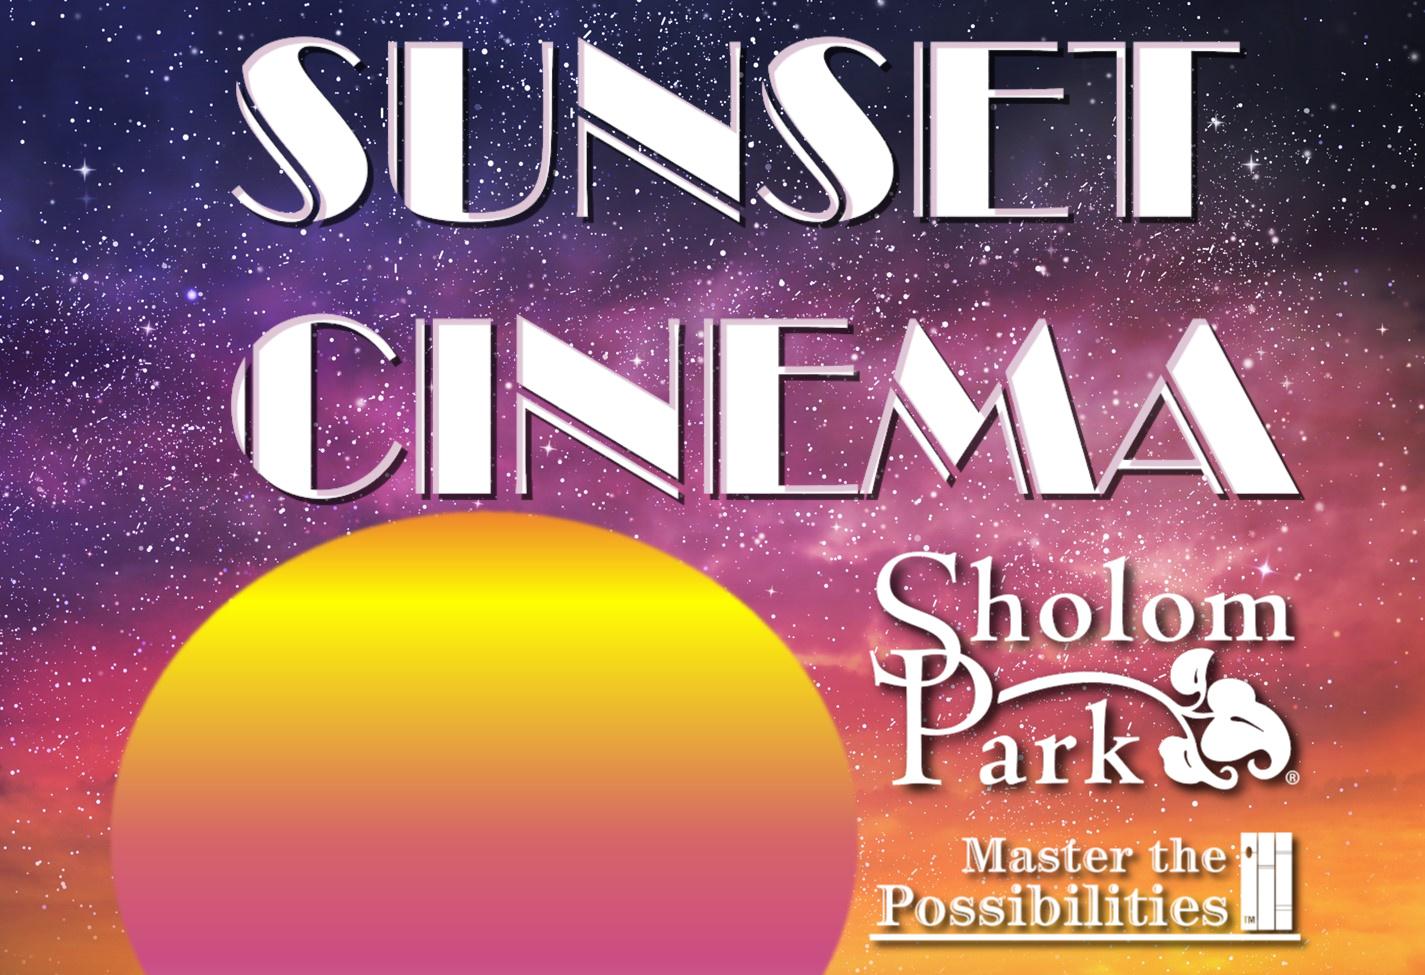 Sunset Cinema image